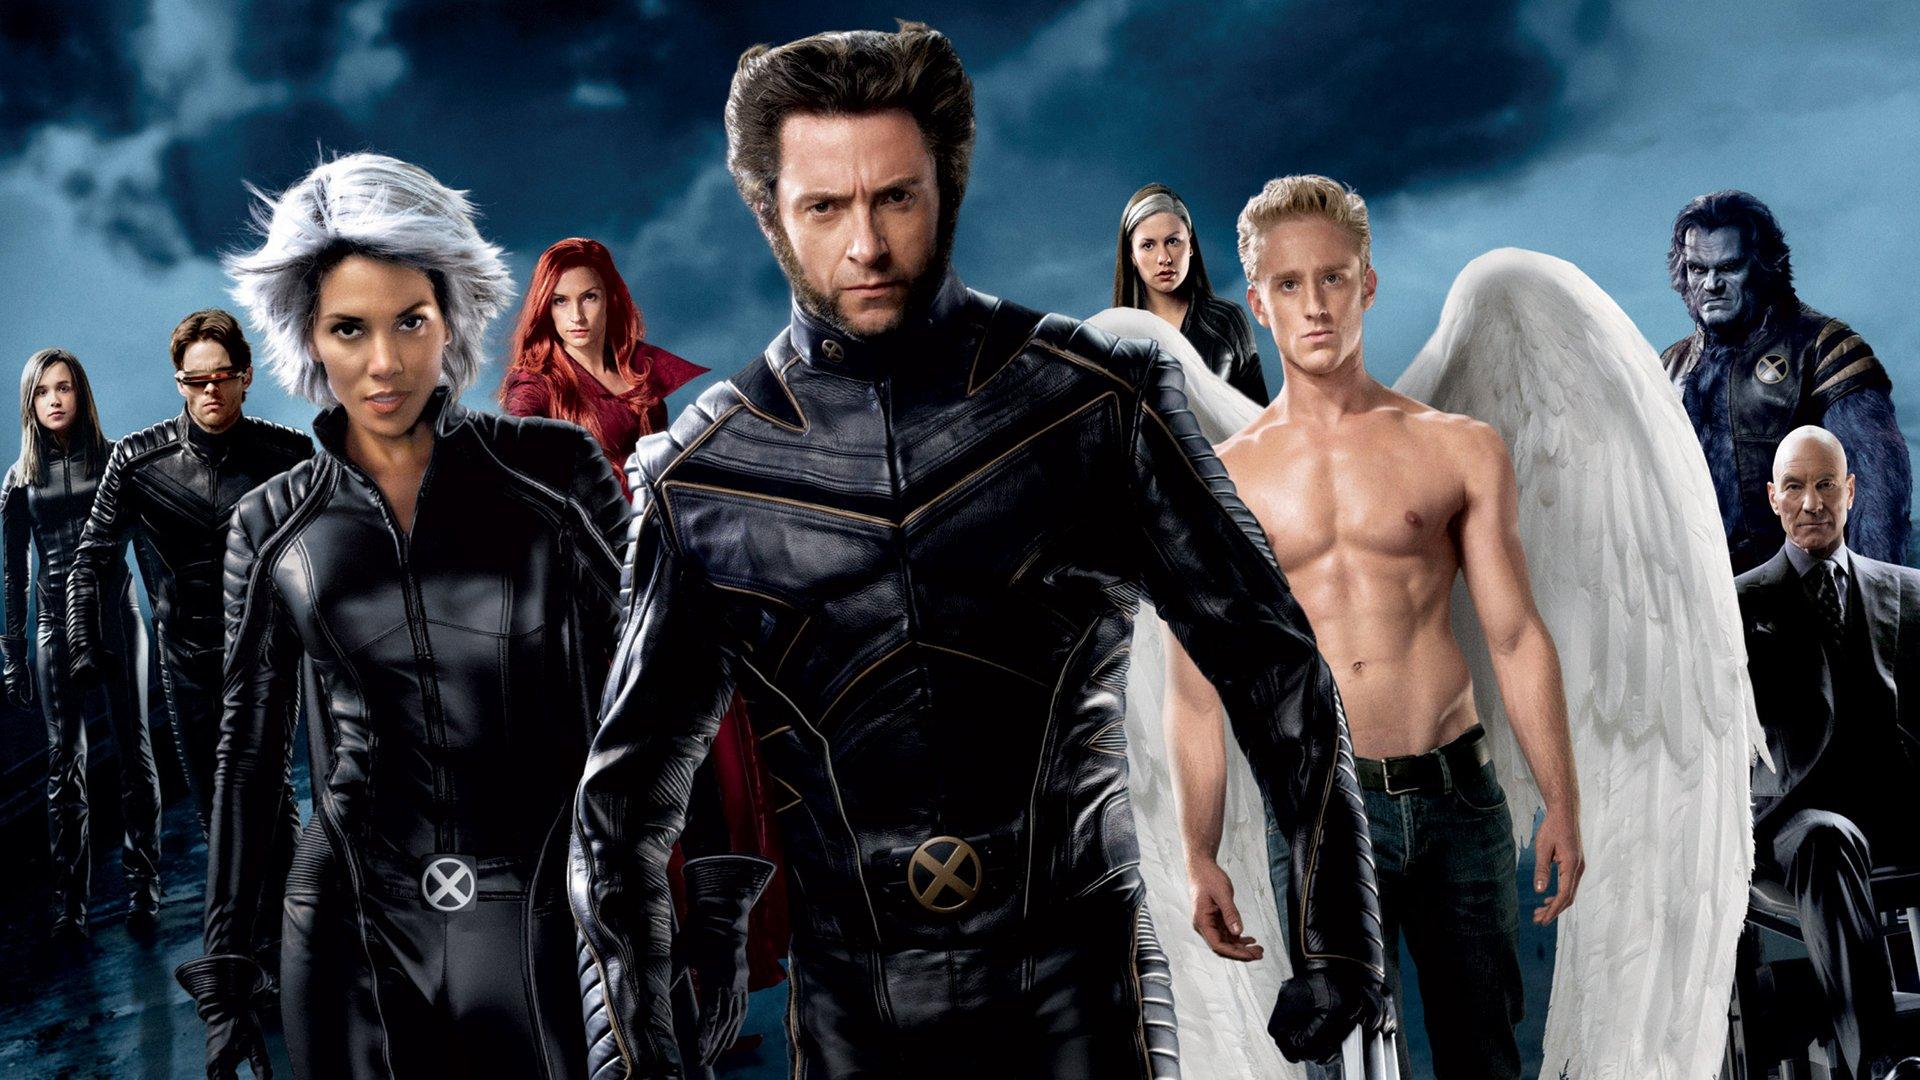 download HQ X Men 3 Movie Wallpaper HQ Wallpapers [1920x1080 1920x1080